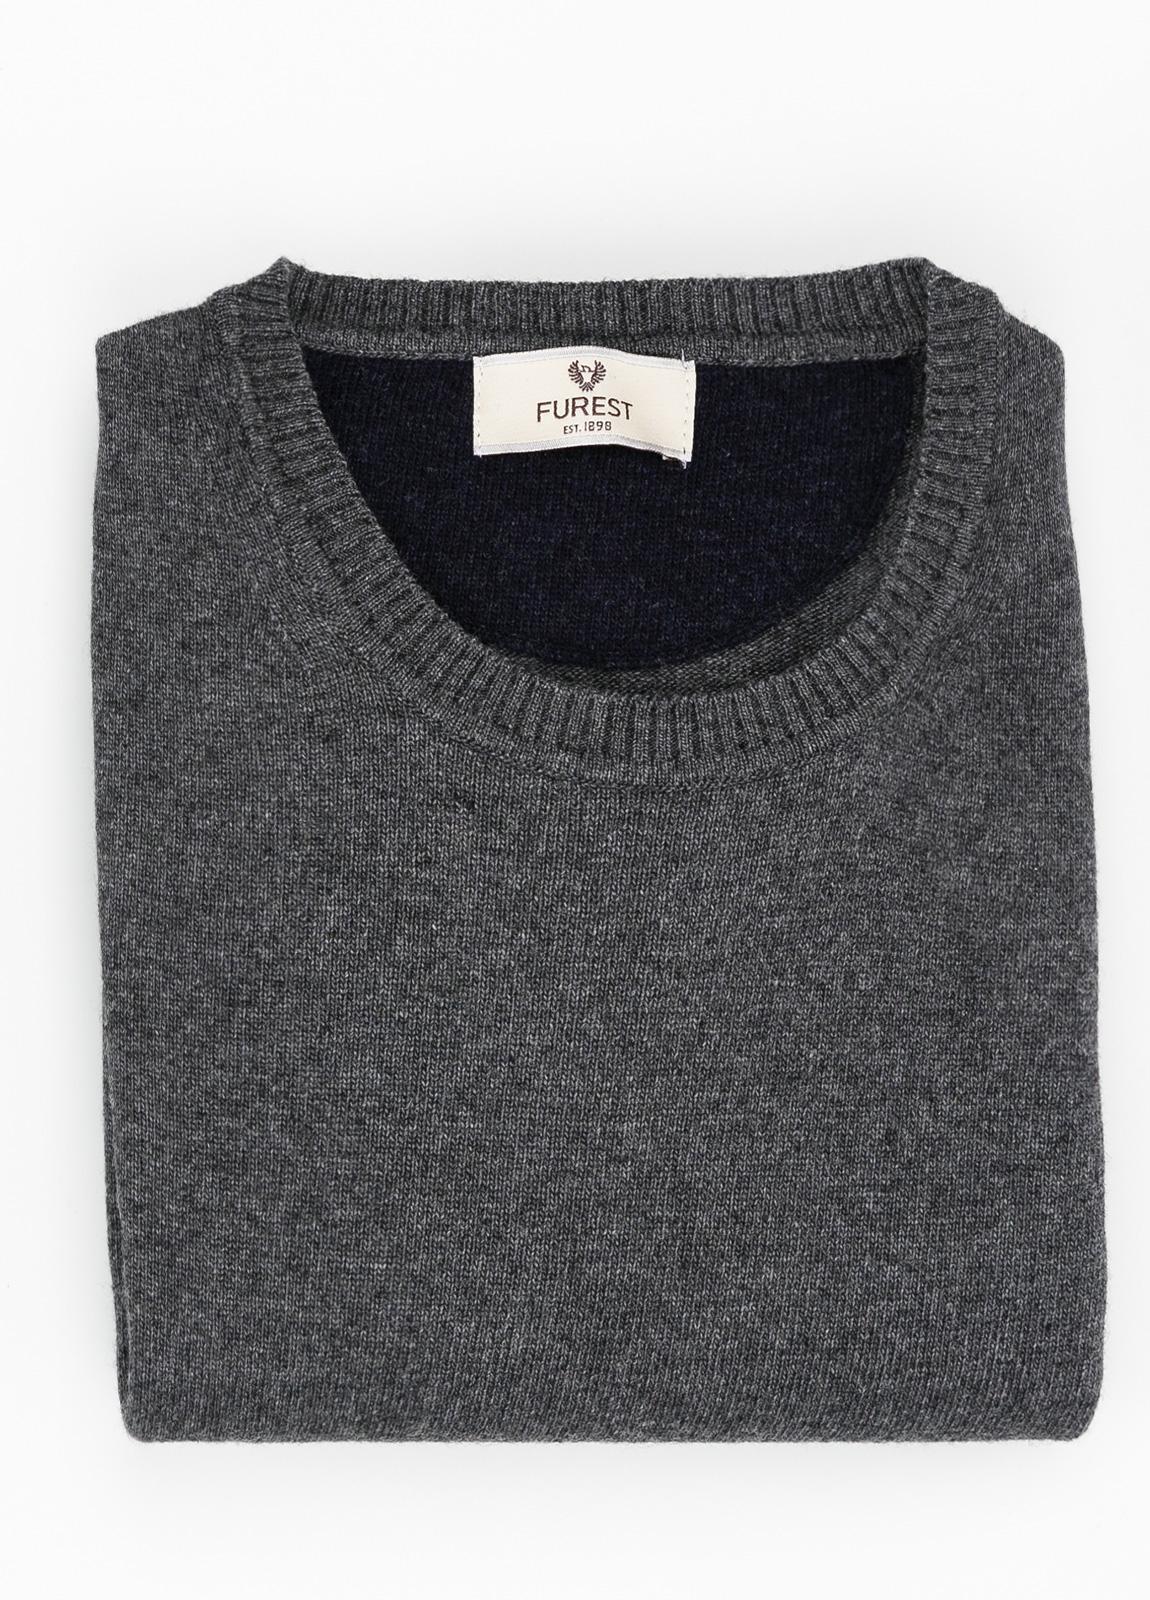 Jersey liso cuello redondo color gris vigoré, 40% lana merino, 20% viscosa, 10% cachemire - Ítem1